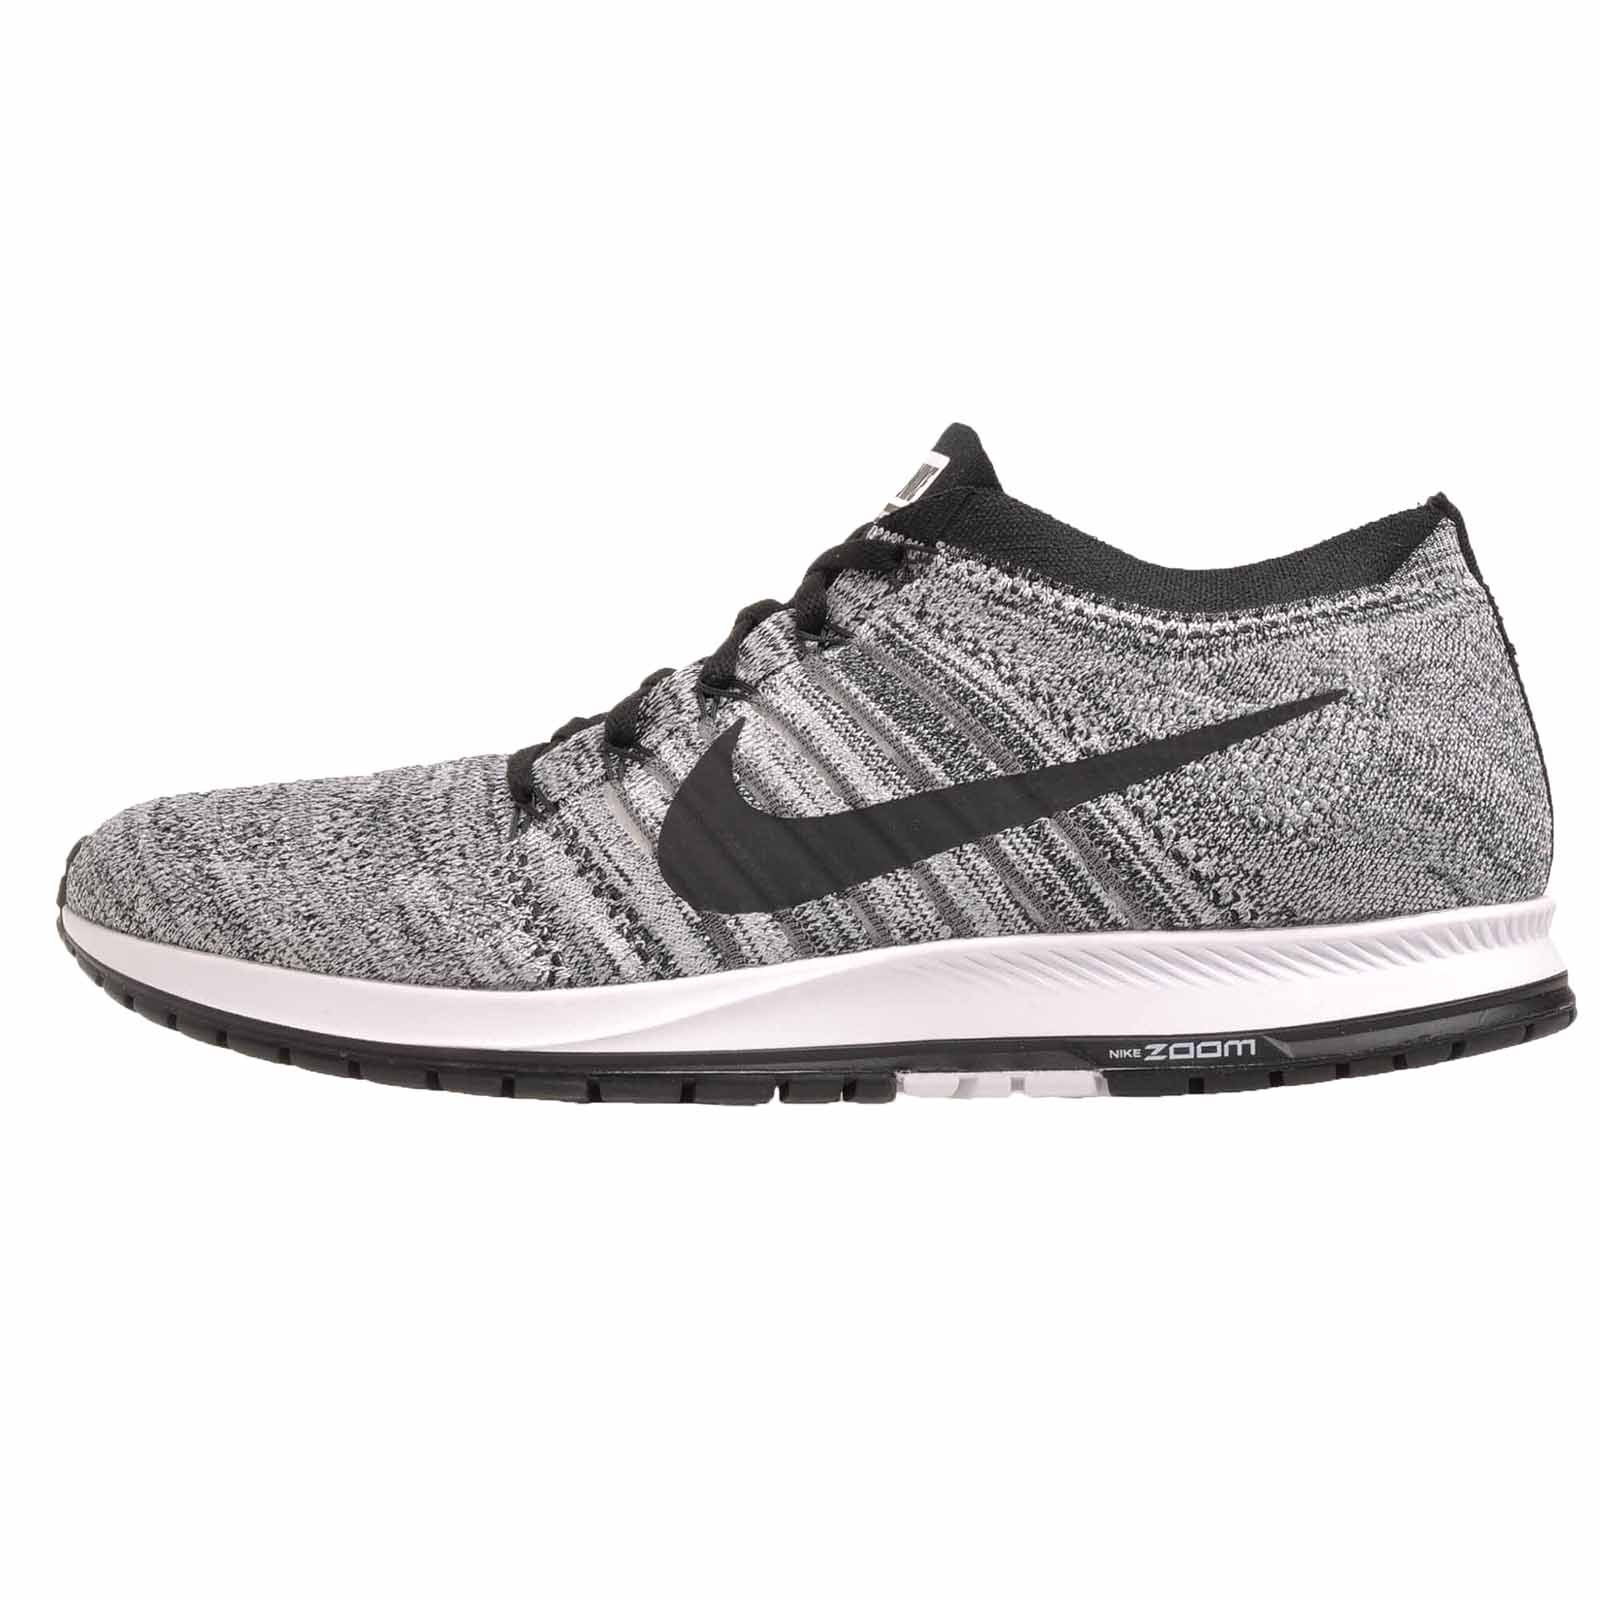 7ce3afded391b Nike Flyknit Streak Unisex Running Shoes Black/Black-Wolf Grey-White  835994-003 (11.5 D(M) US)